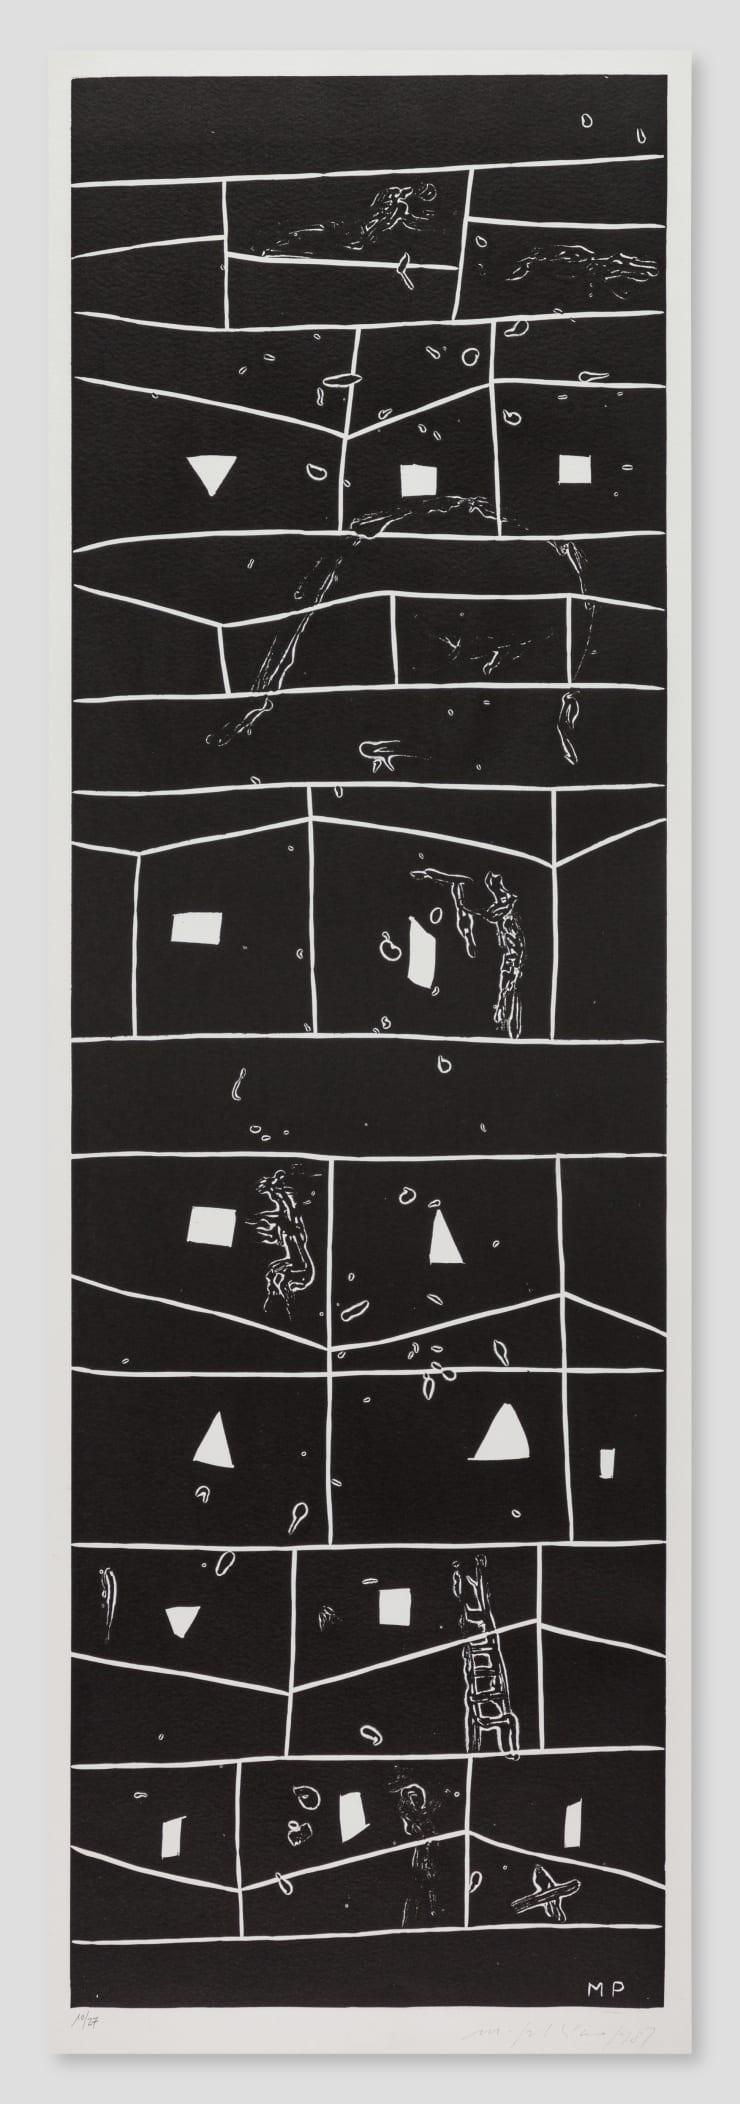 Mimmo Paladino, Atlantico V (Rectangular Grid with Figures), 1987